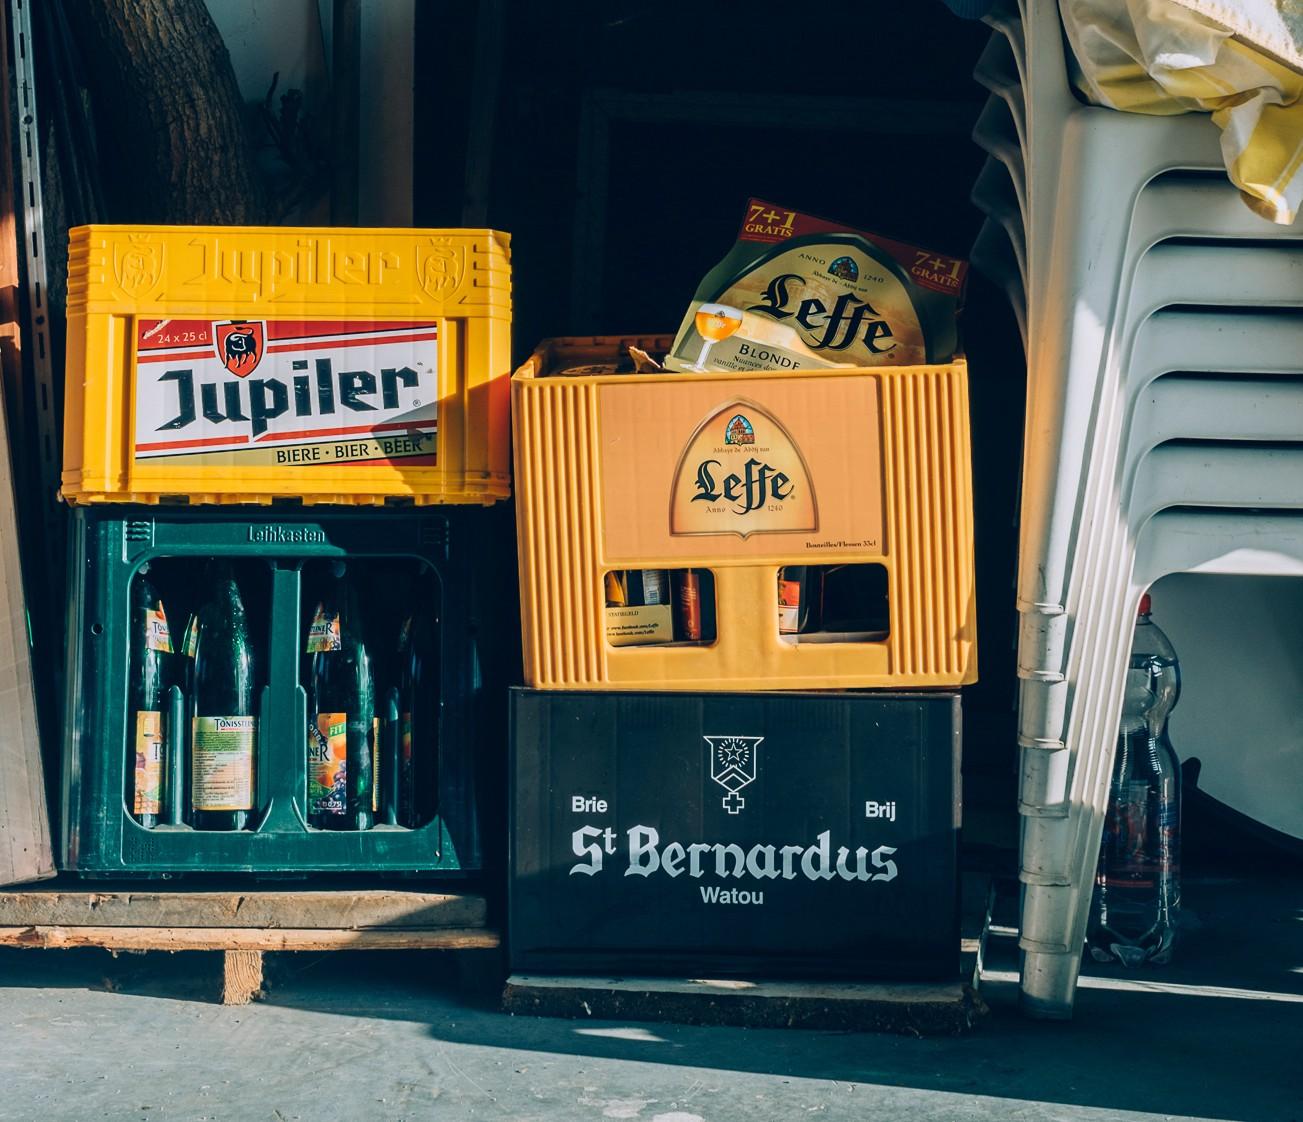 Bierdrinkende oma's - bierbakken